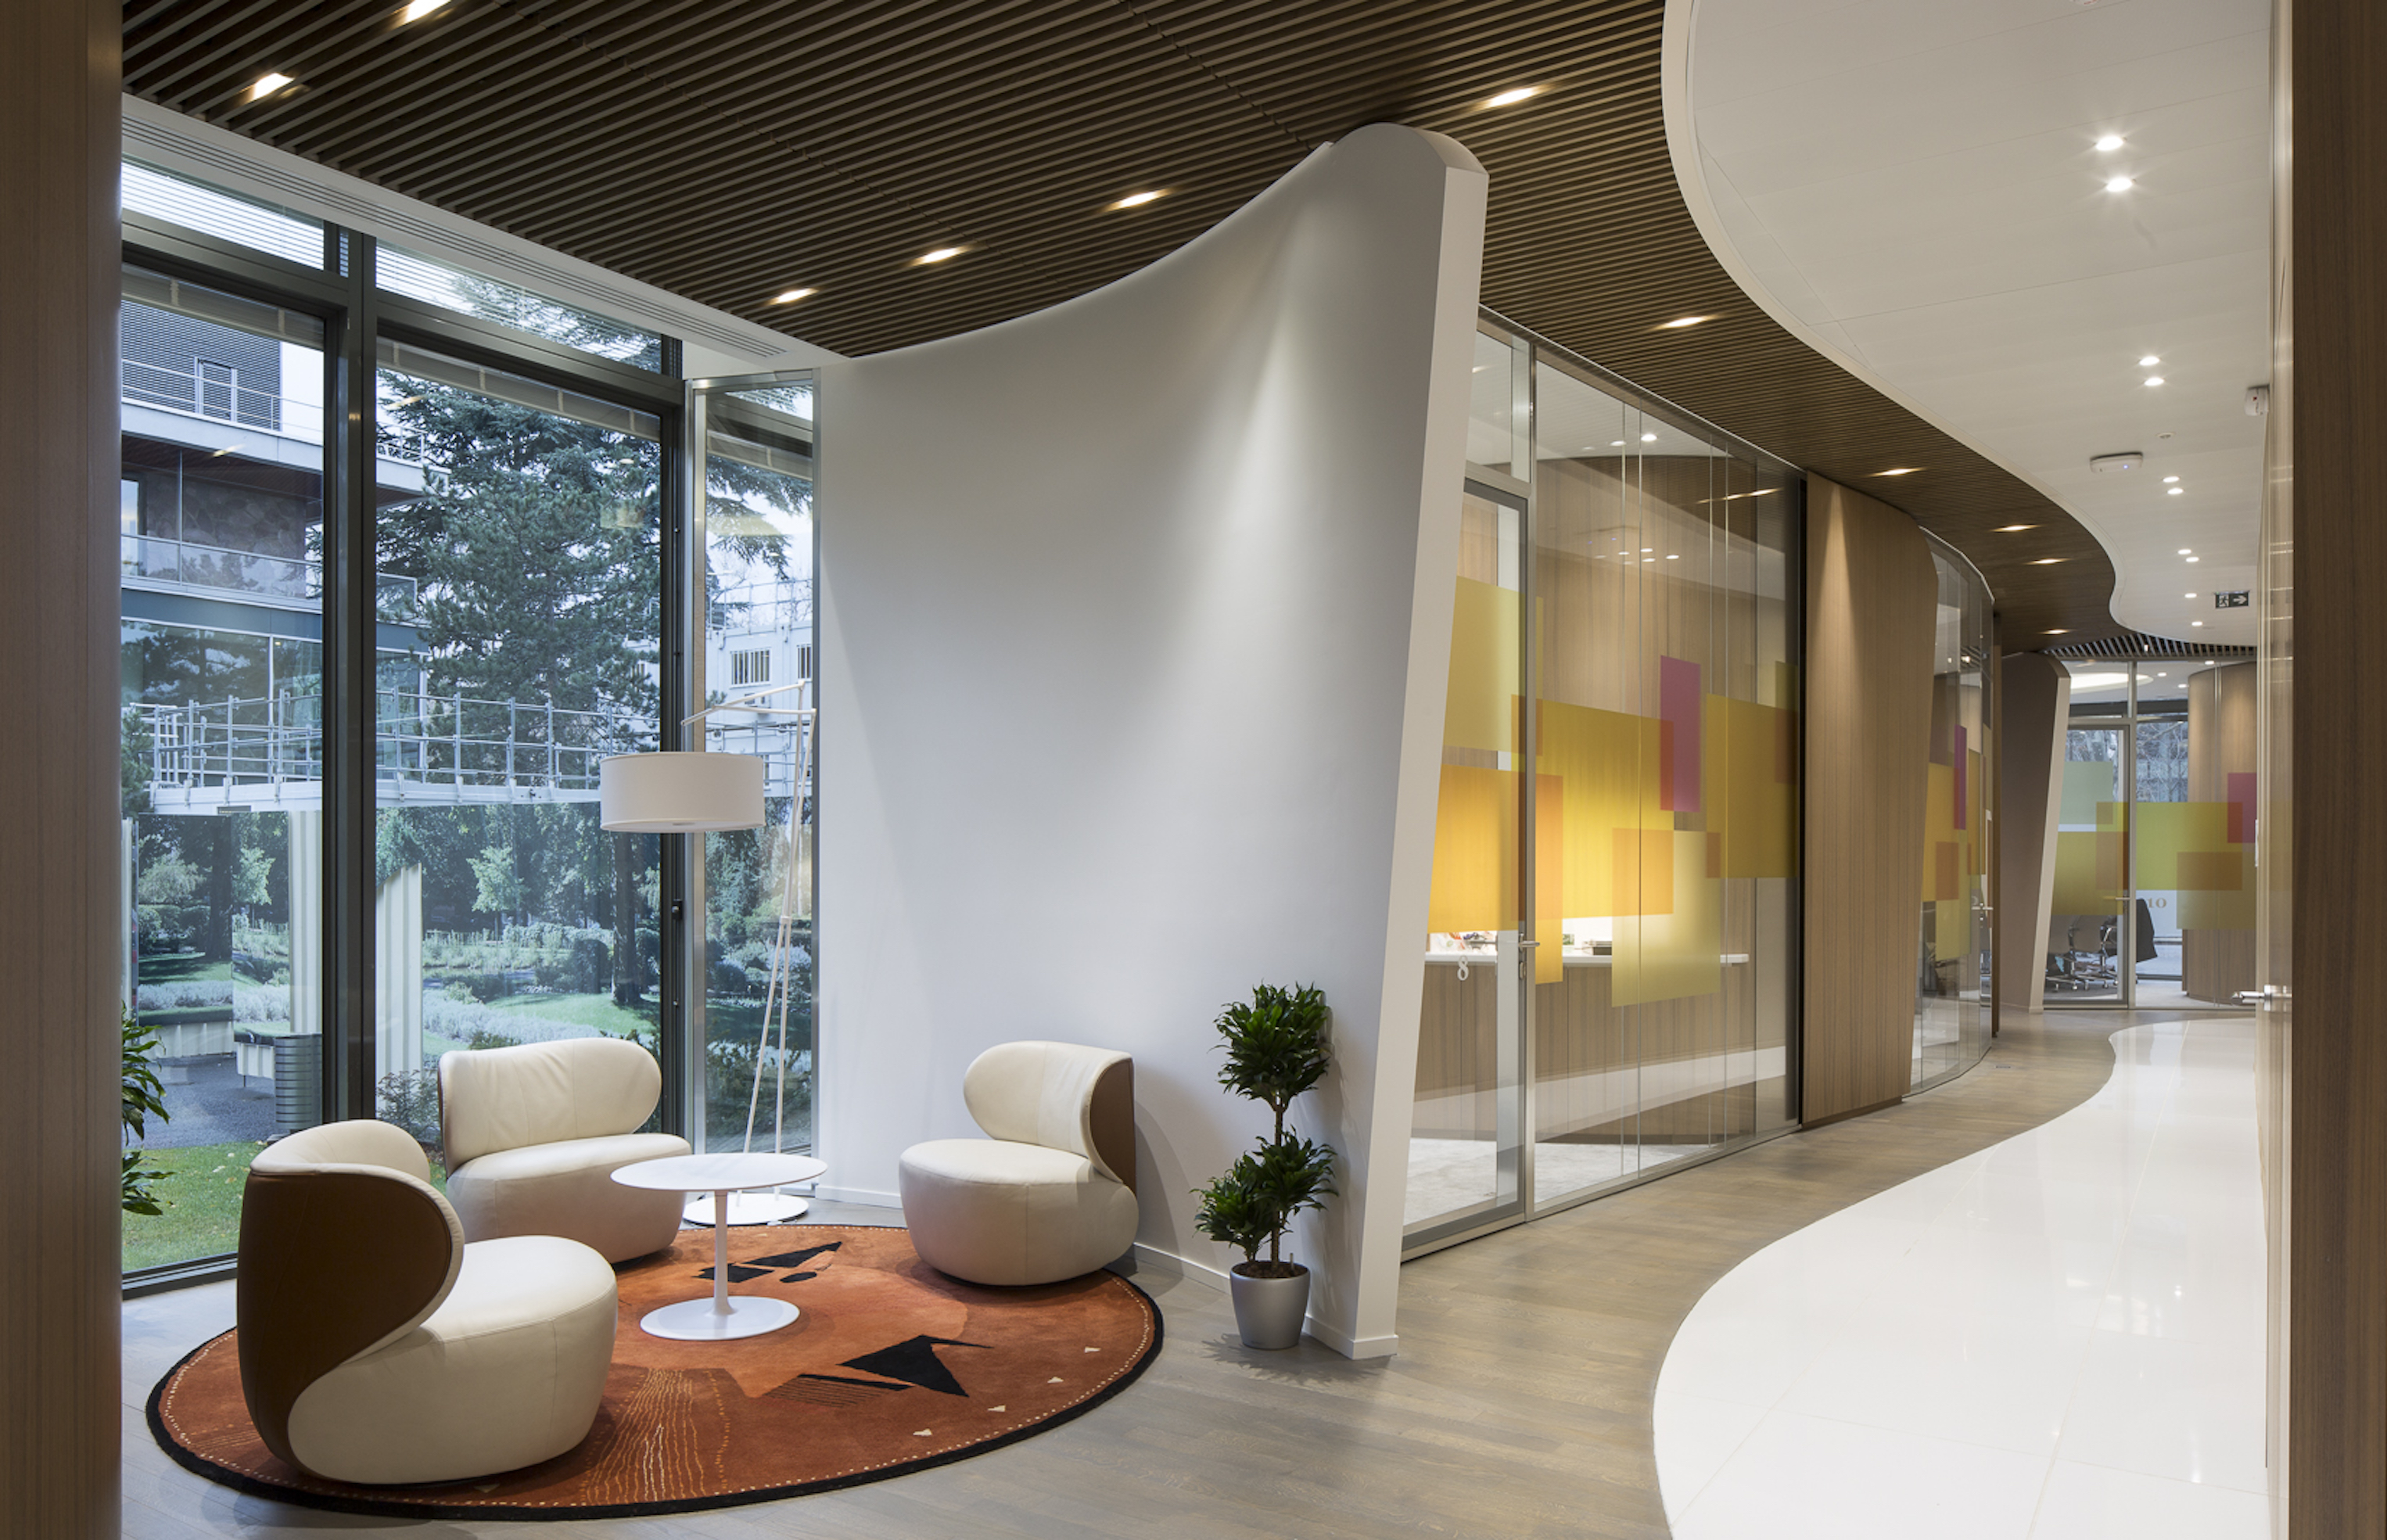 pwc rdc espace client alsea. Black Bedroom Furniture Sets. Home Design Ideas